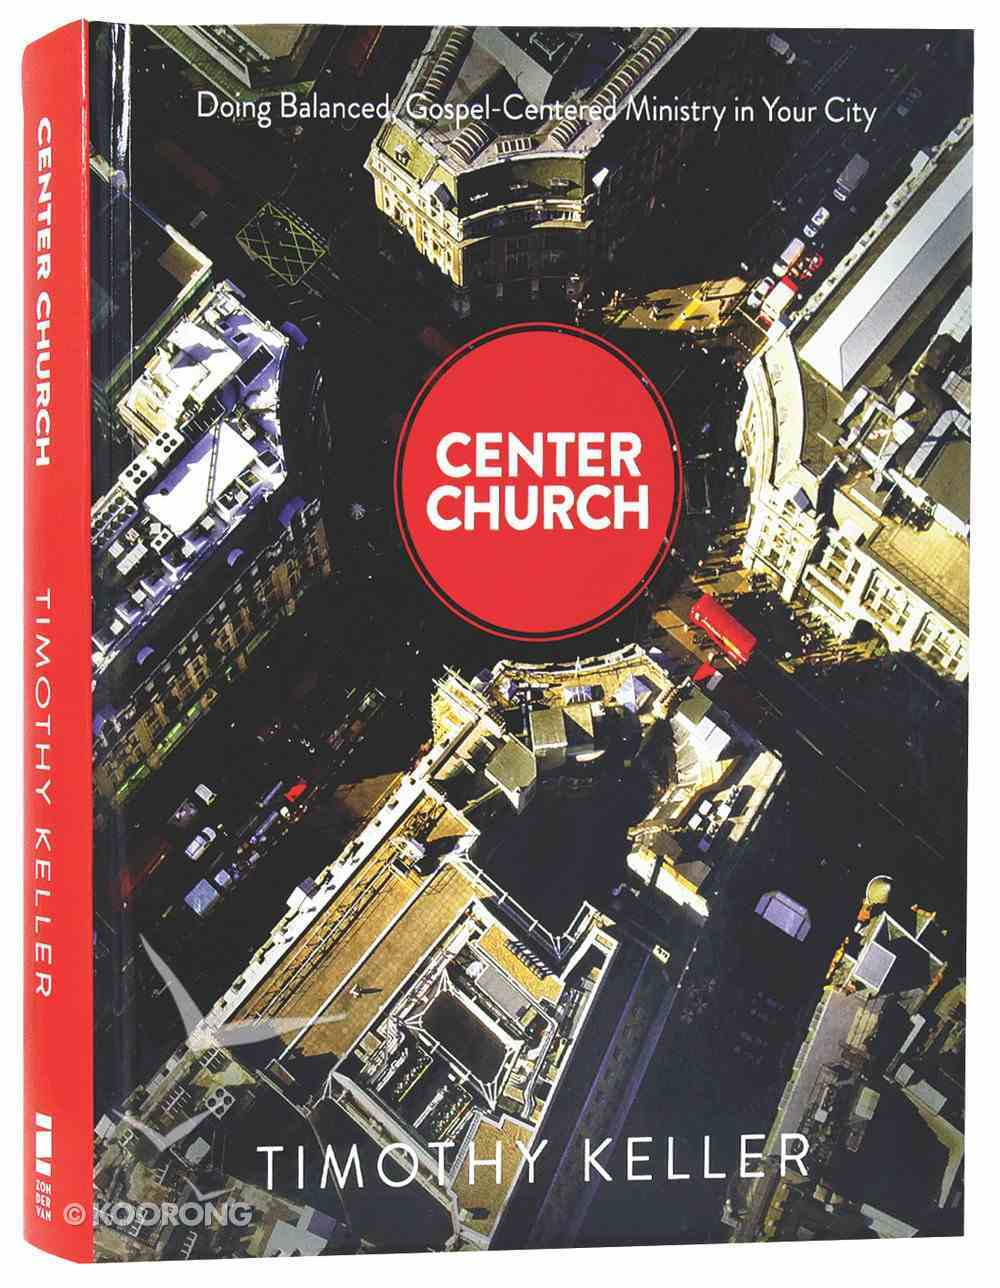 Center Church: Doing Balanced, Gospel-Centered Ministry in Your City Hardback